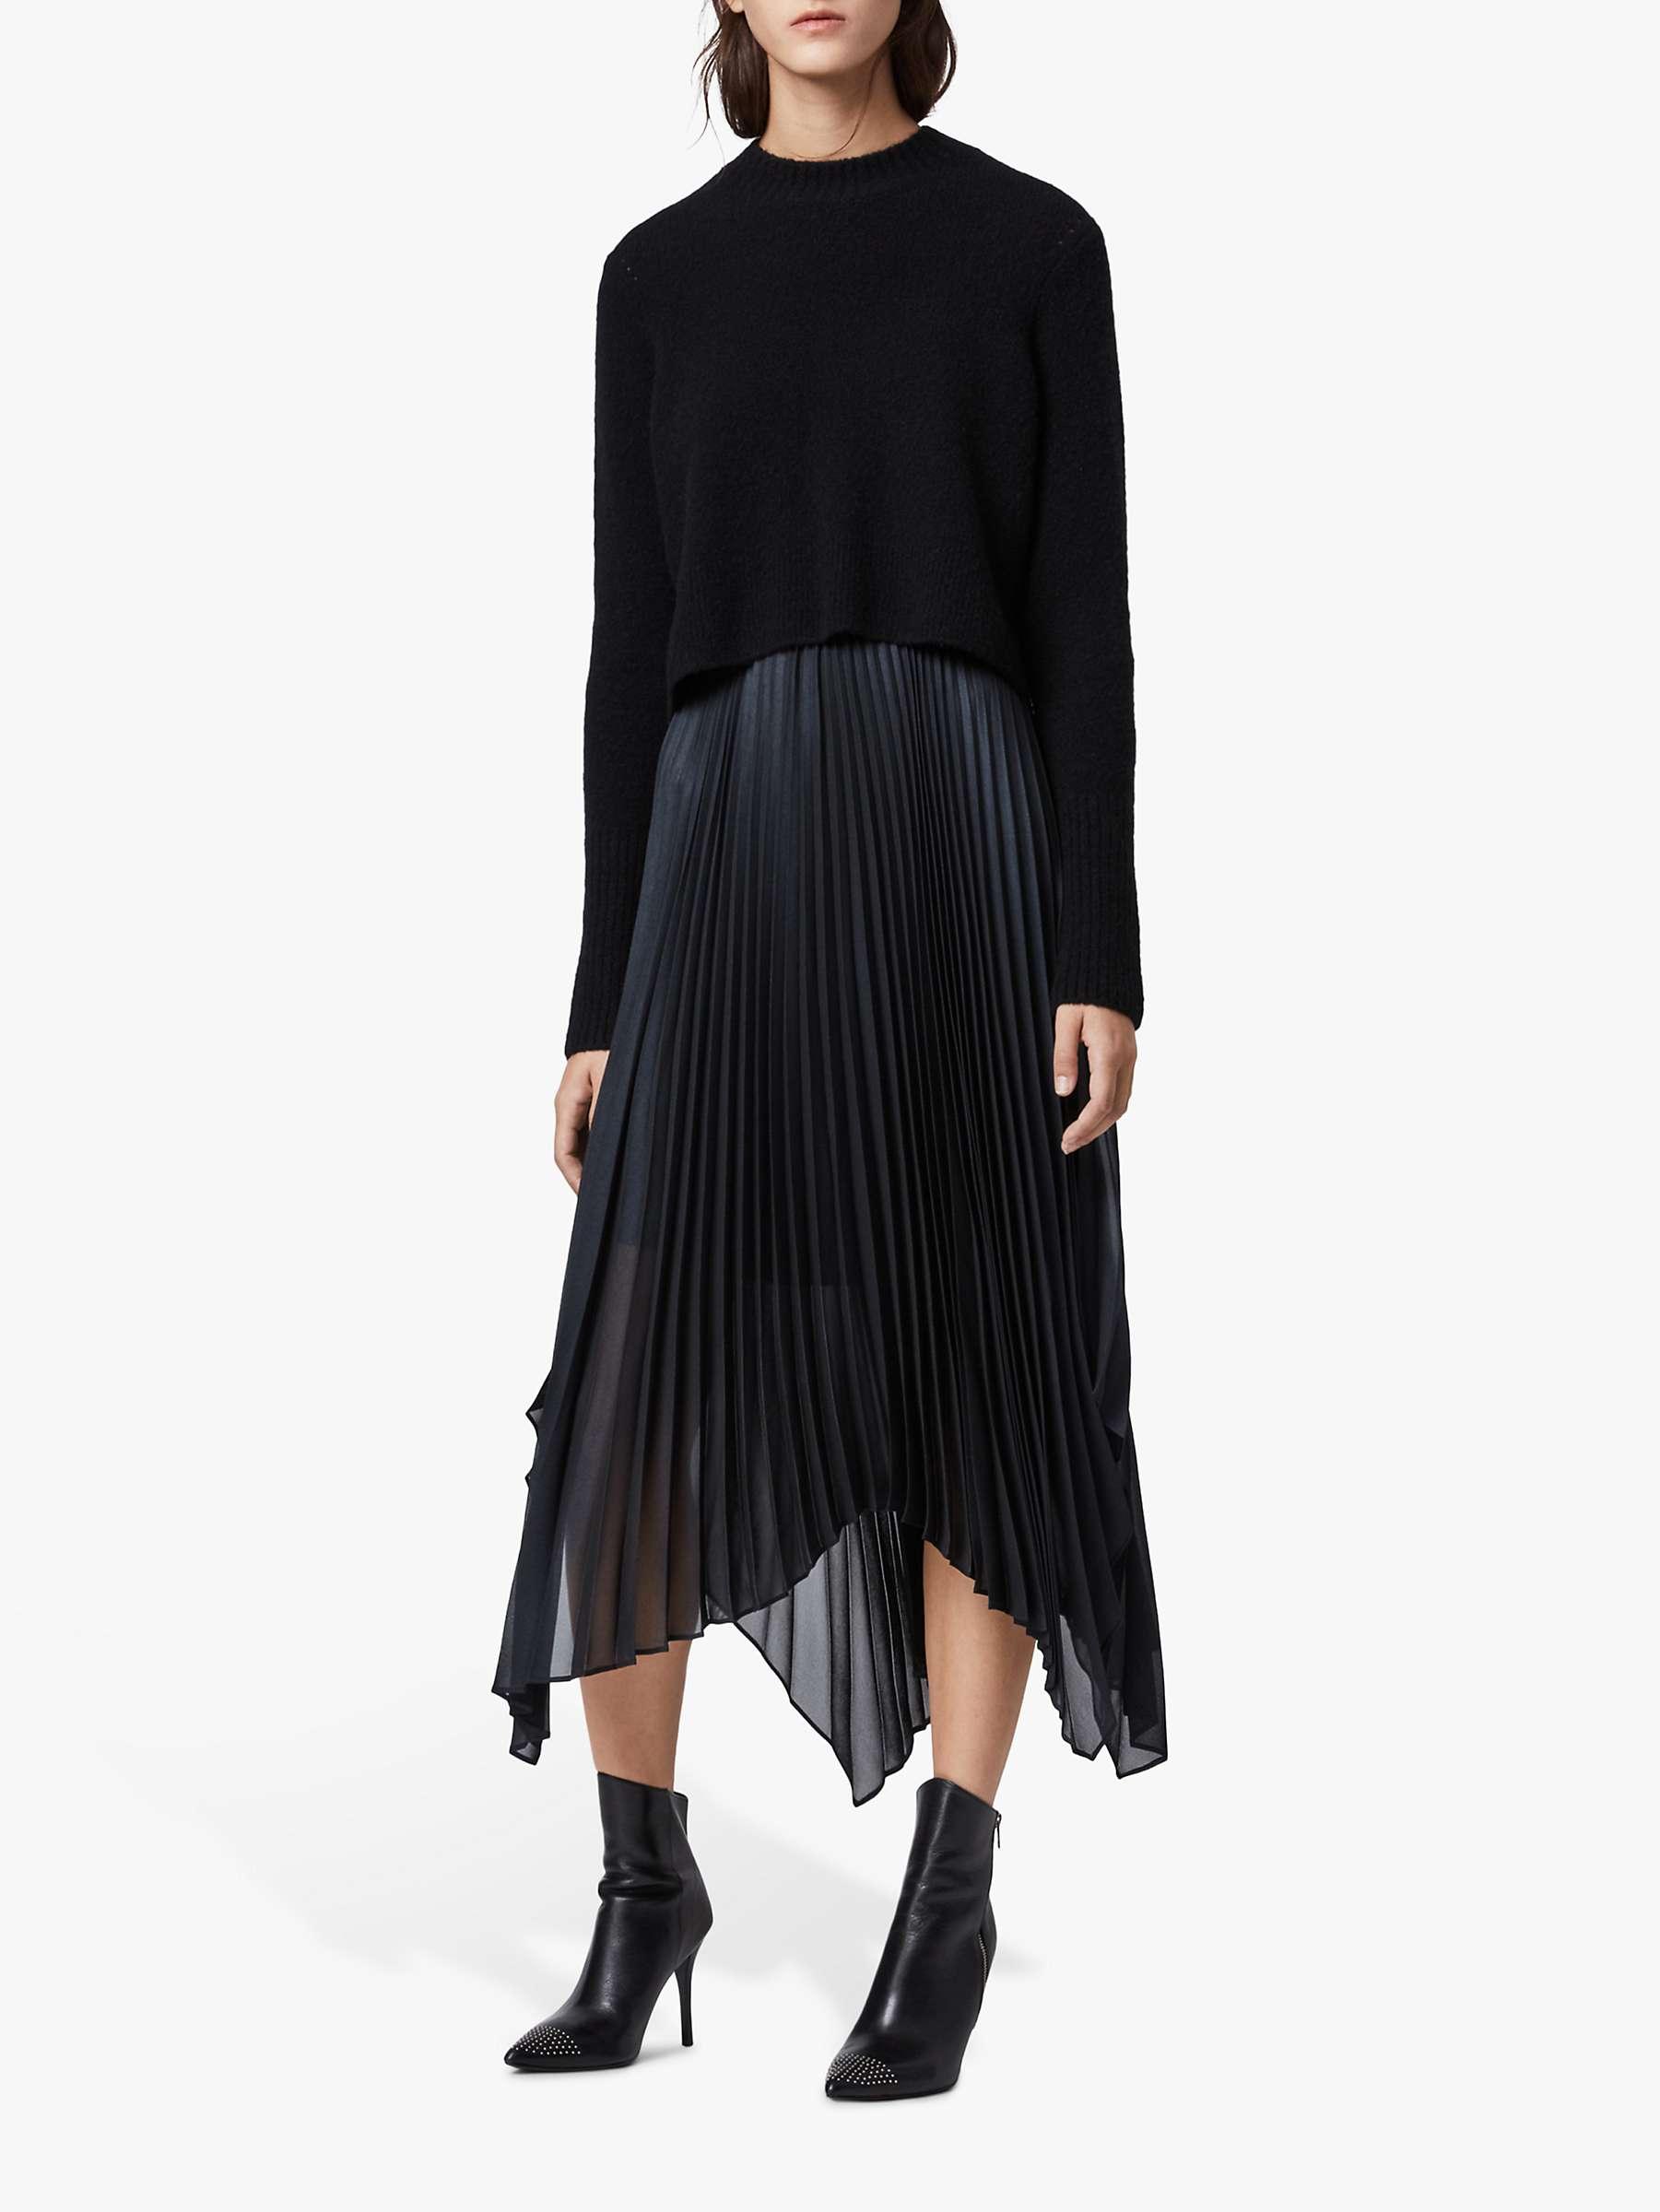 All Saints Lerin Jumper Knit Dress, Black/Ink by John Lewis